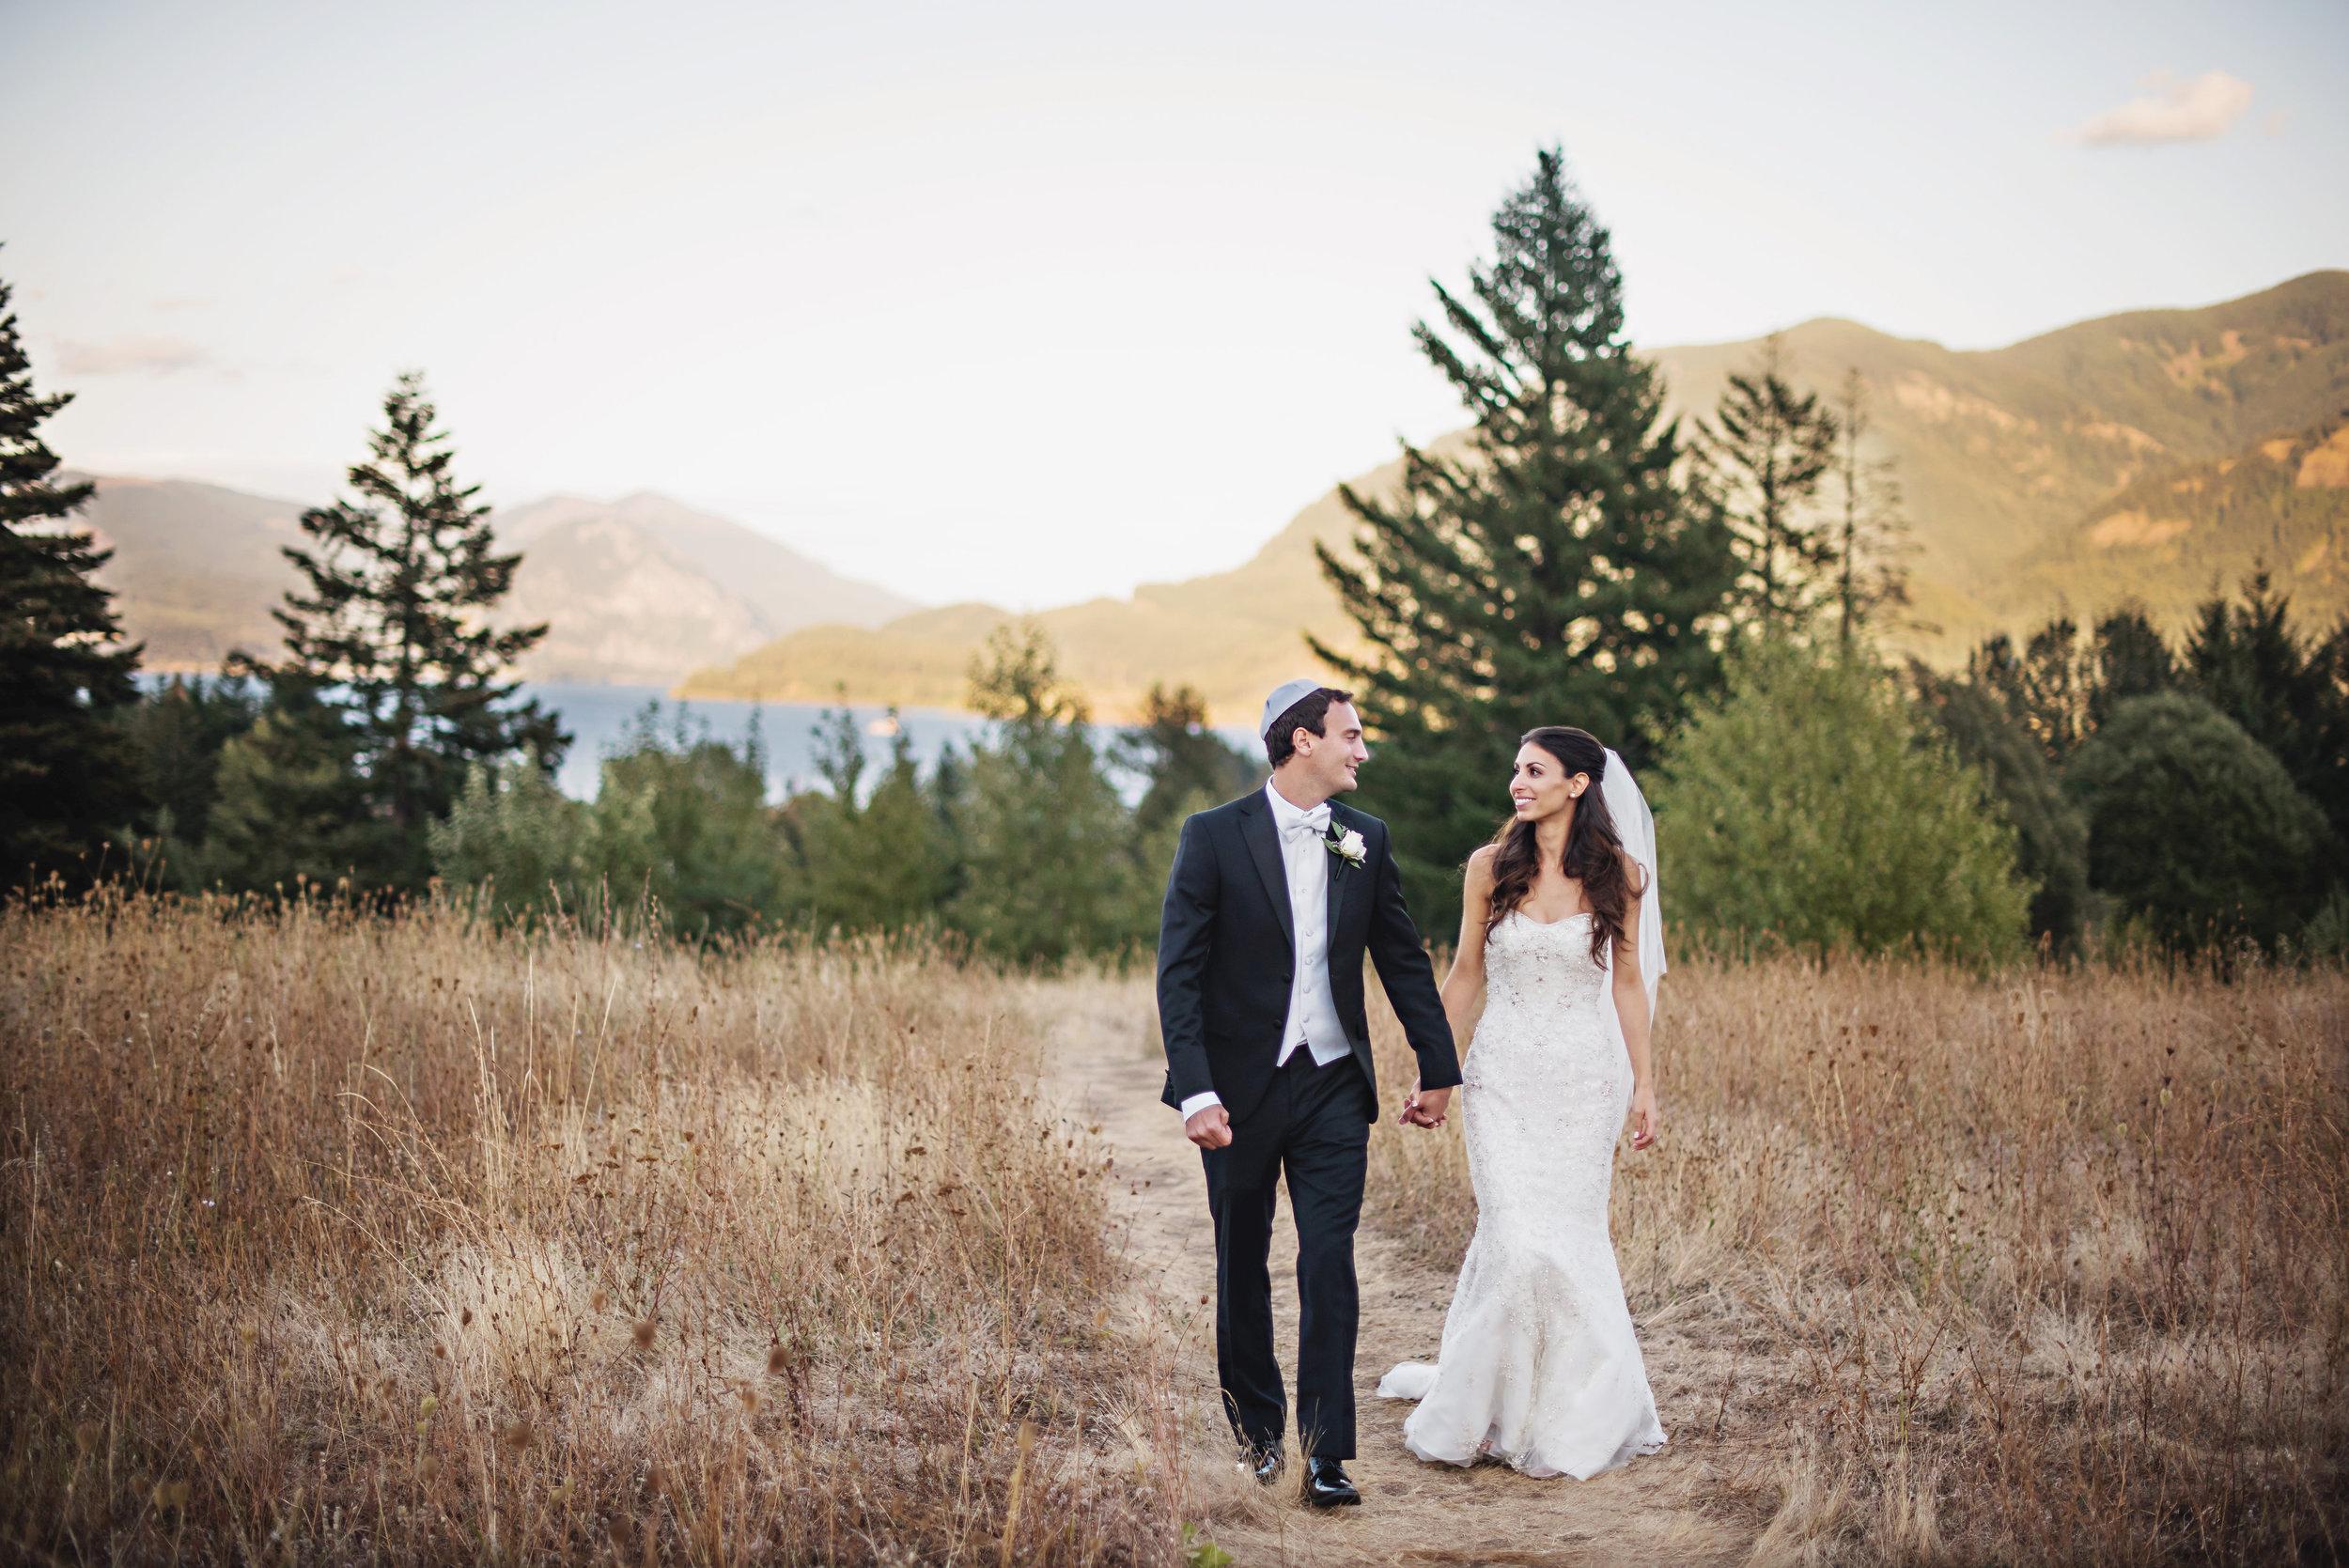 Bridalbliss.com   Columbia Gorge Wedding   Washington Event Planning and Design   Deyla Huss Photography